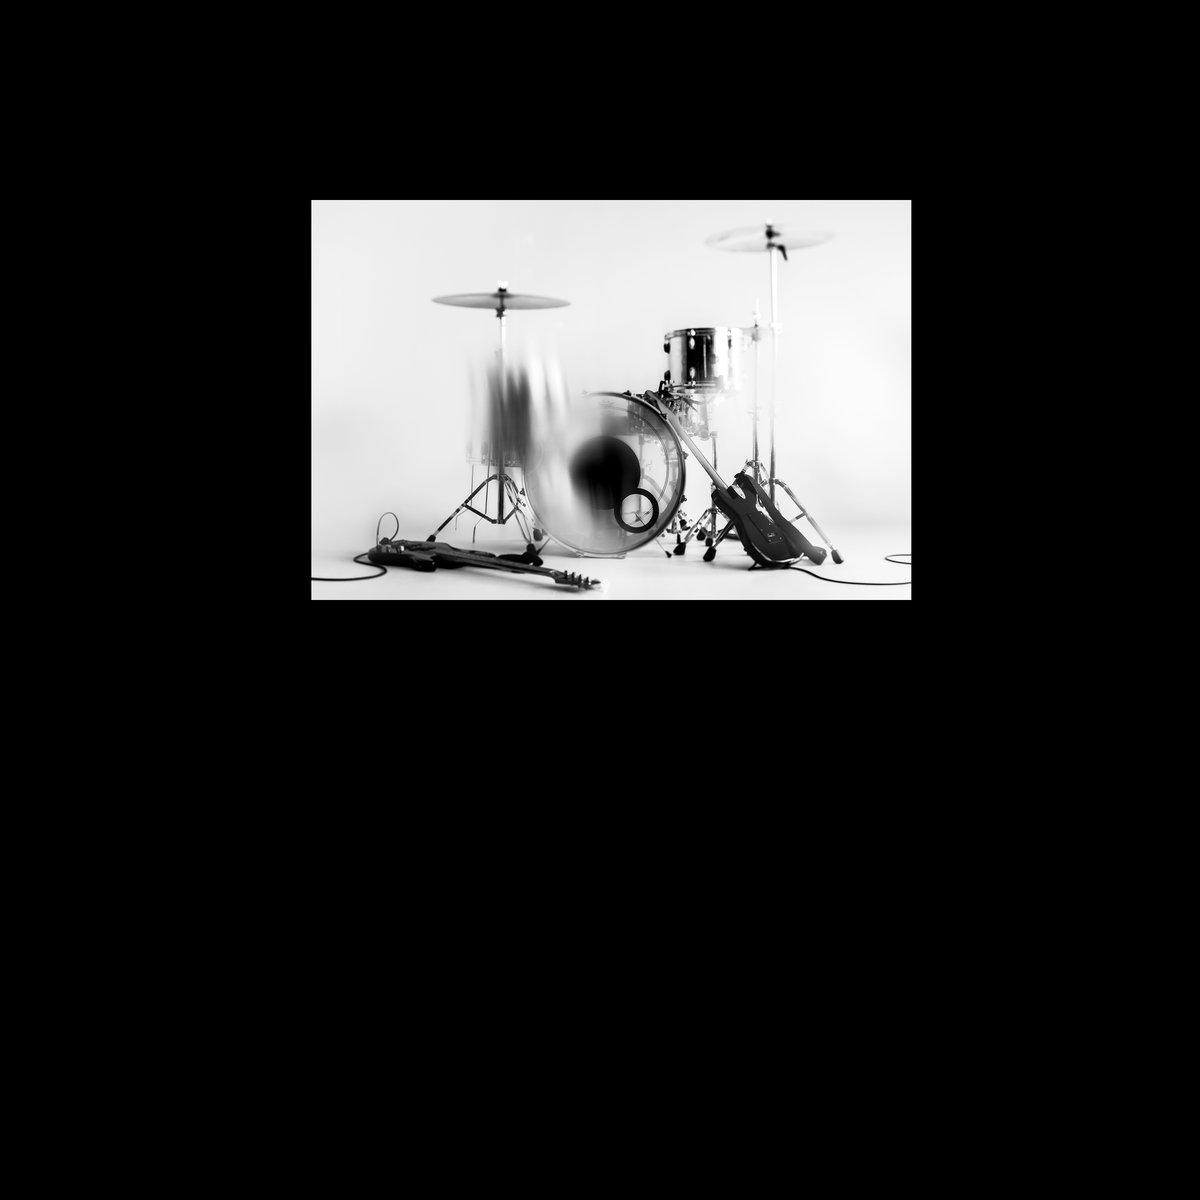 Primitive-Man-x-Hell-split